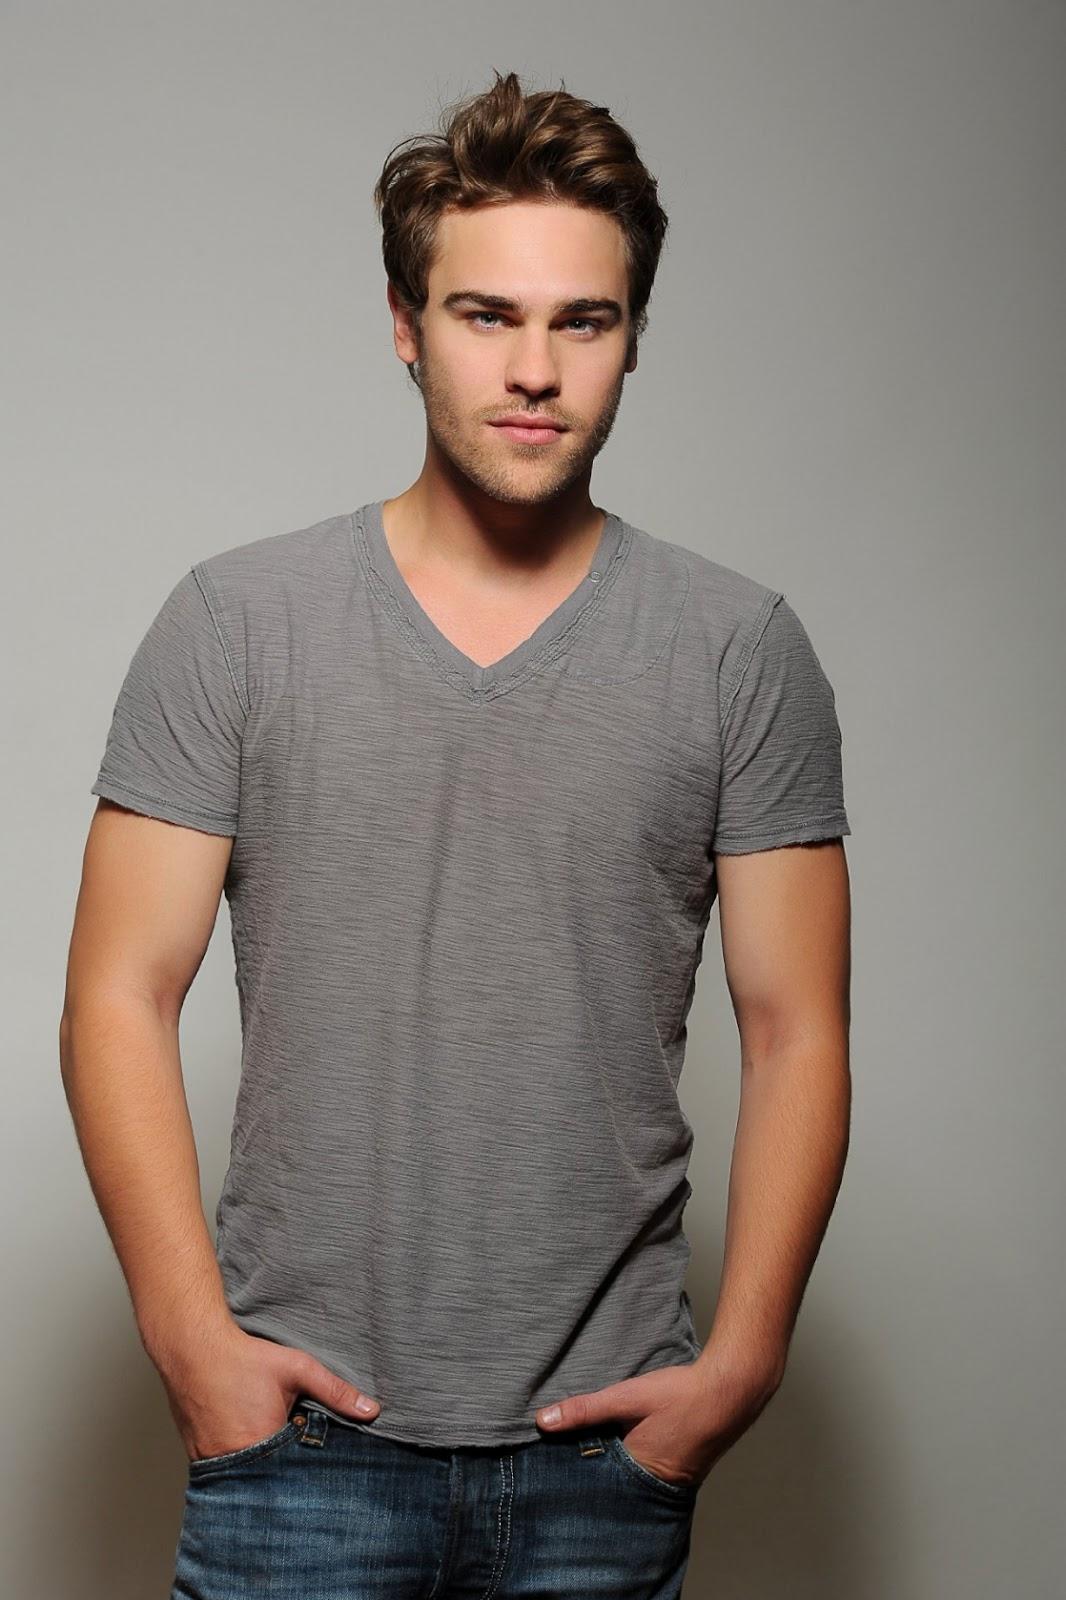 MOST BEAUTIFUL MEN: GREY DAMON